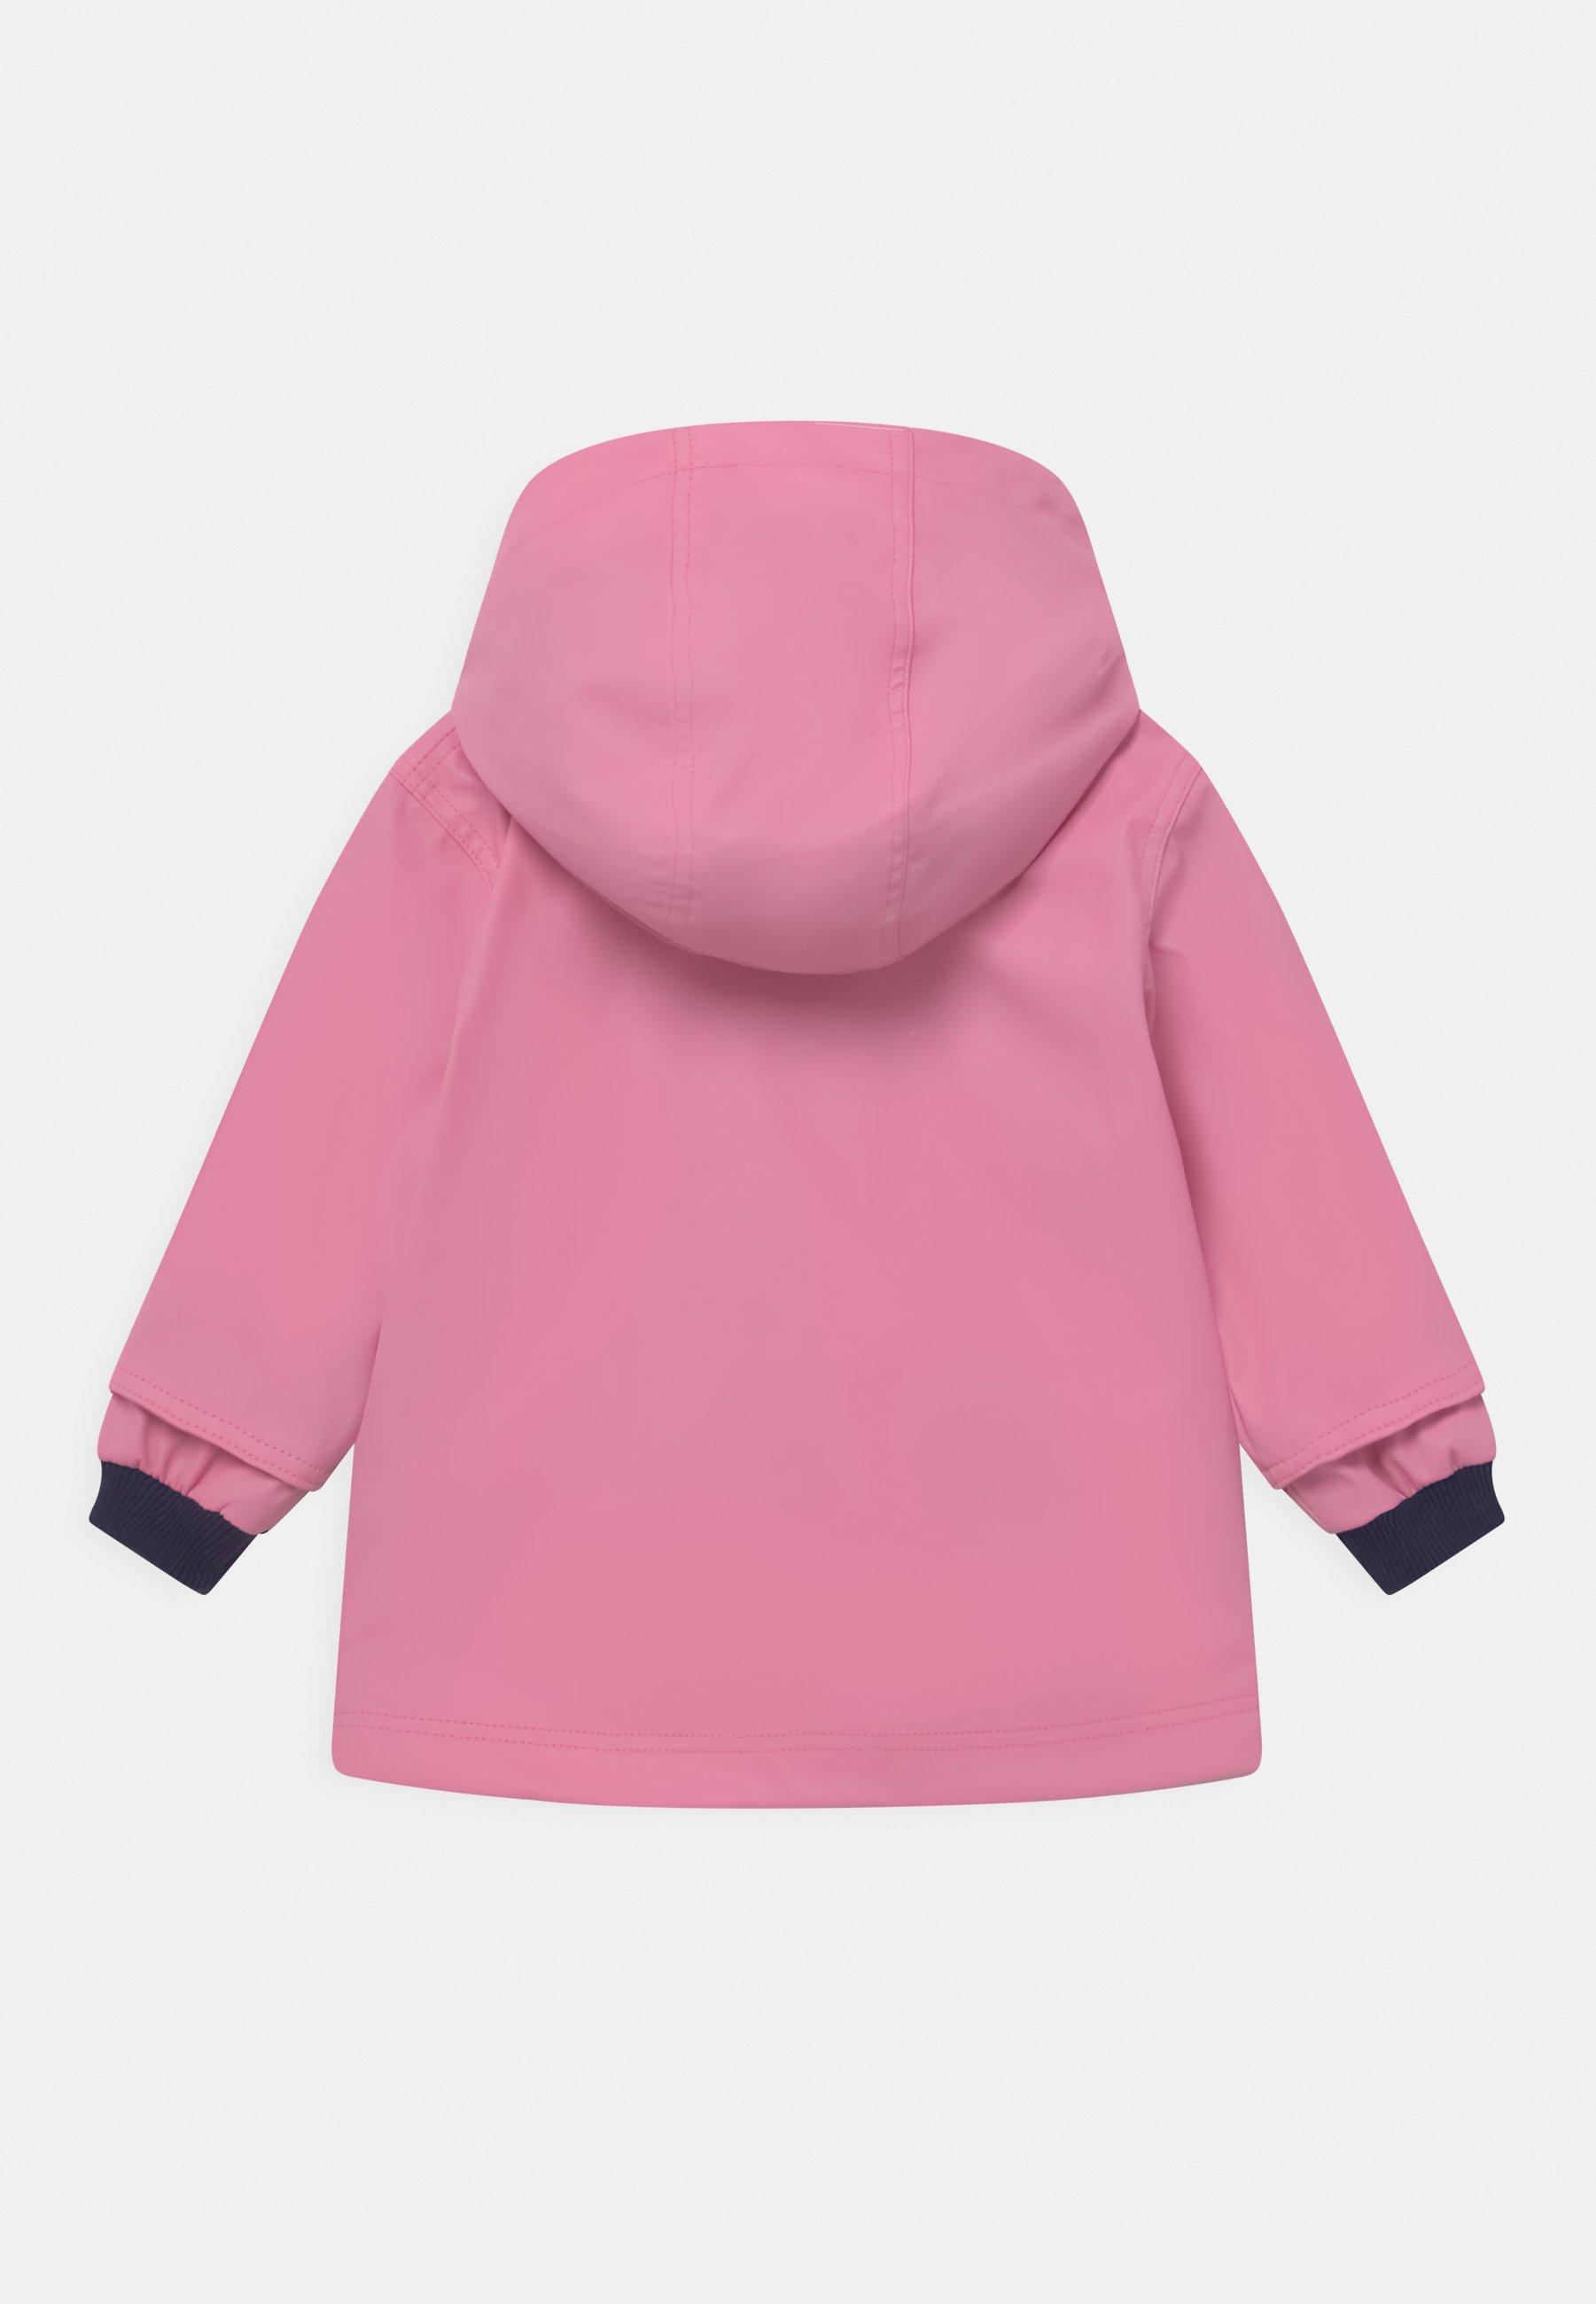 Kinder CIRE - Regenjacke / wasserabweisende Jacke